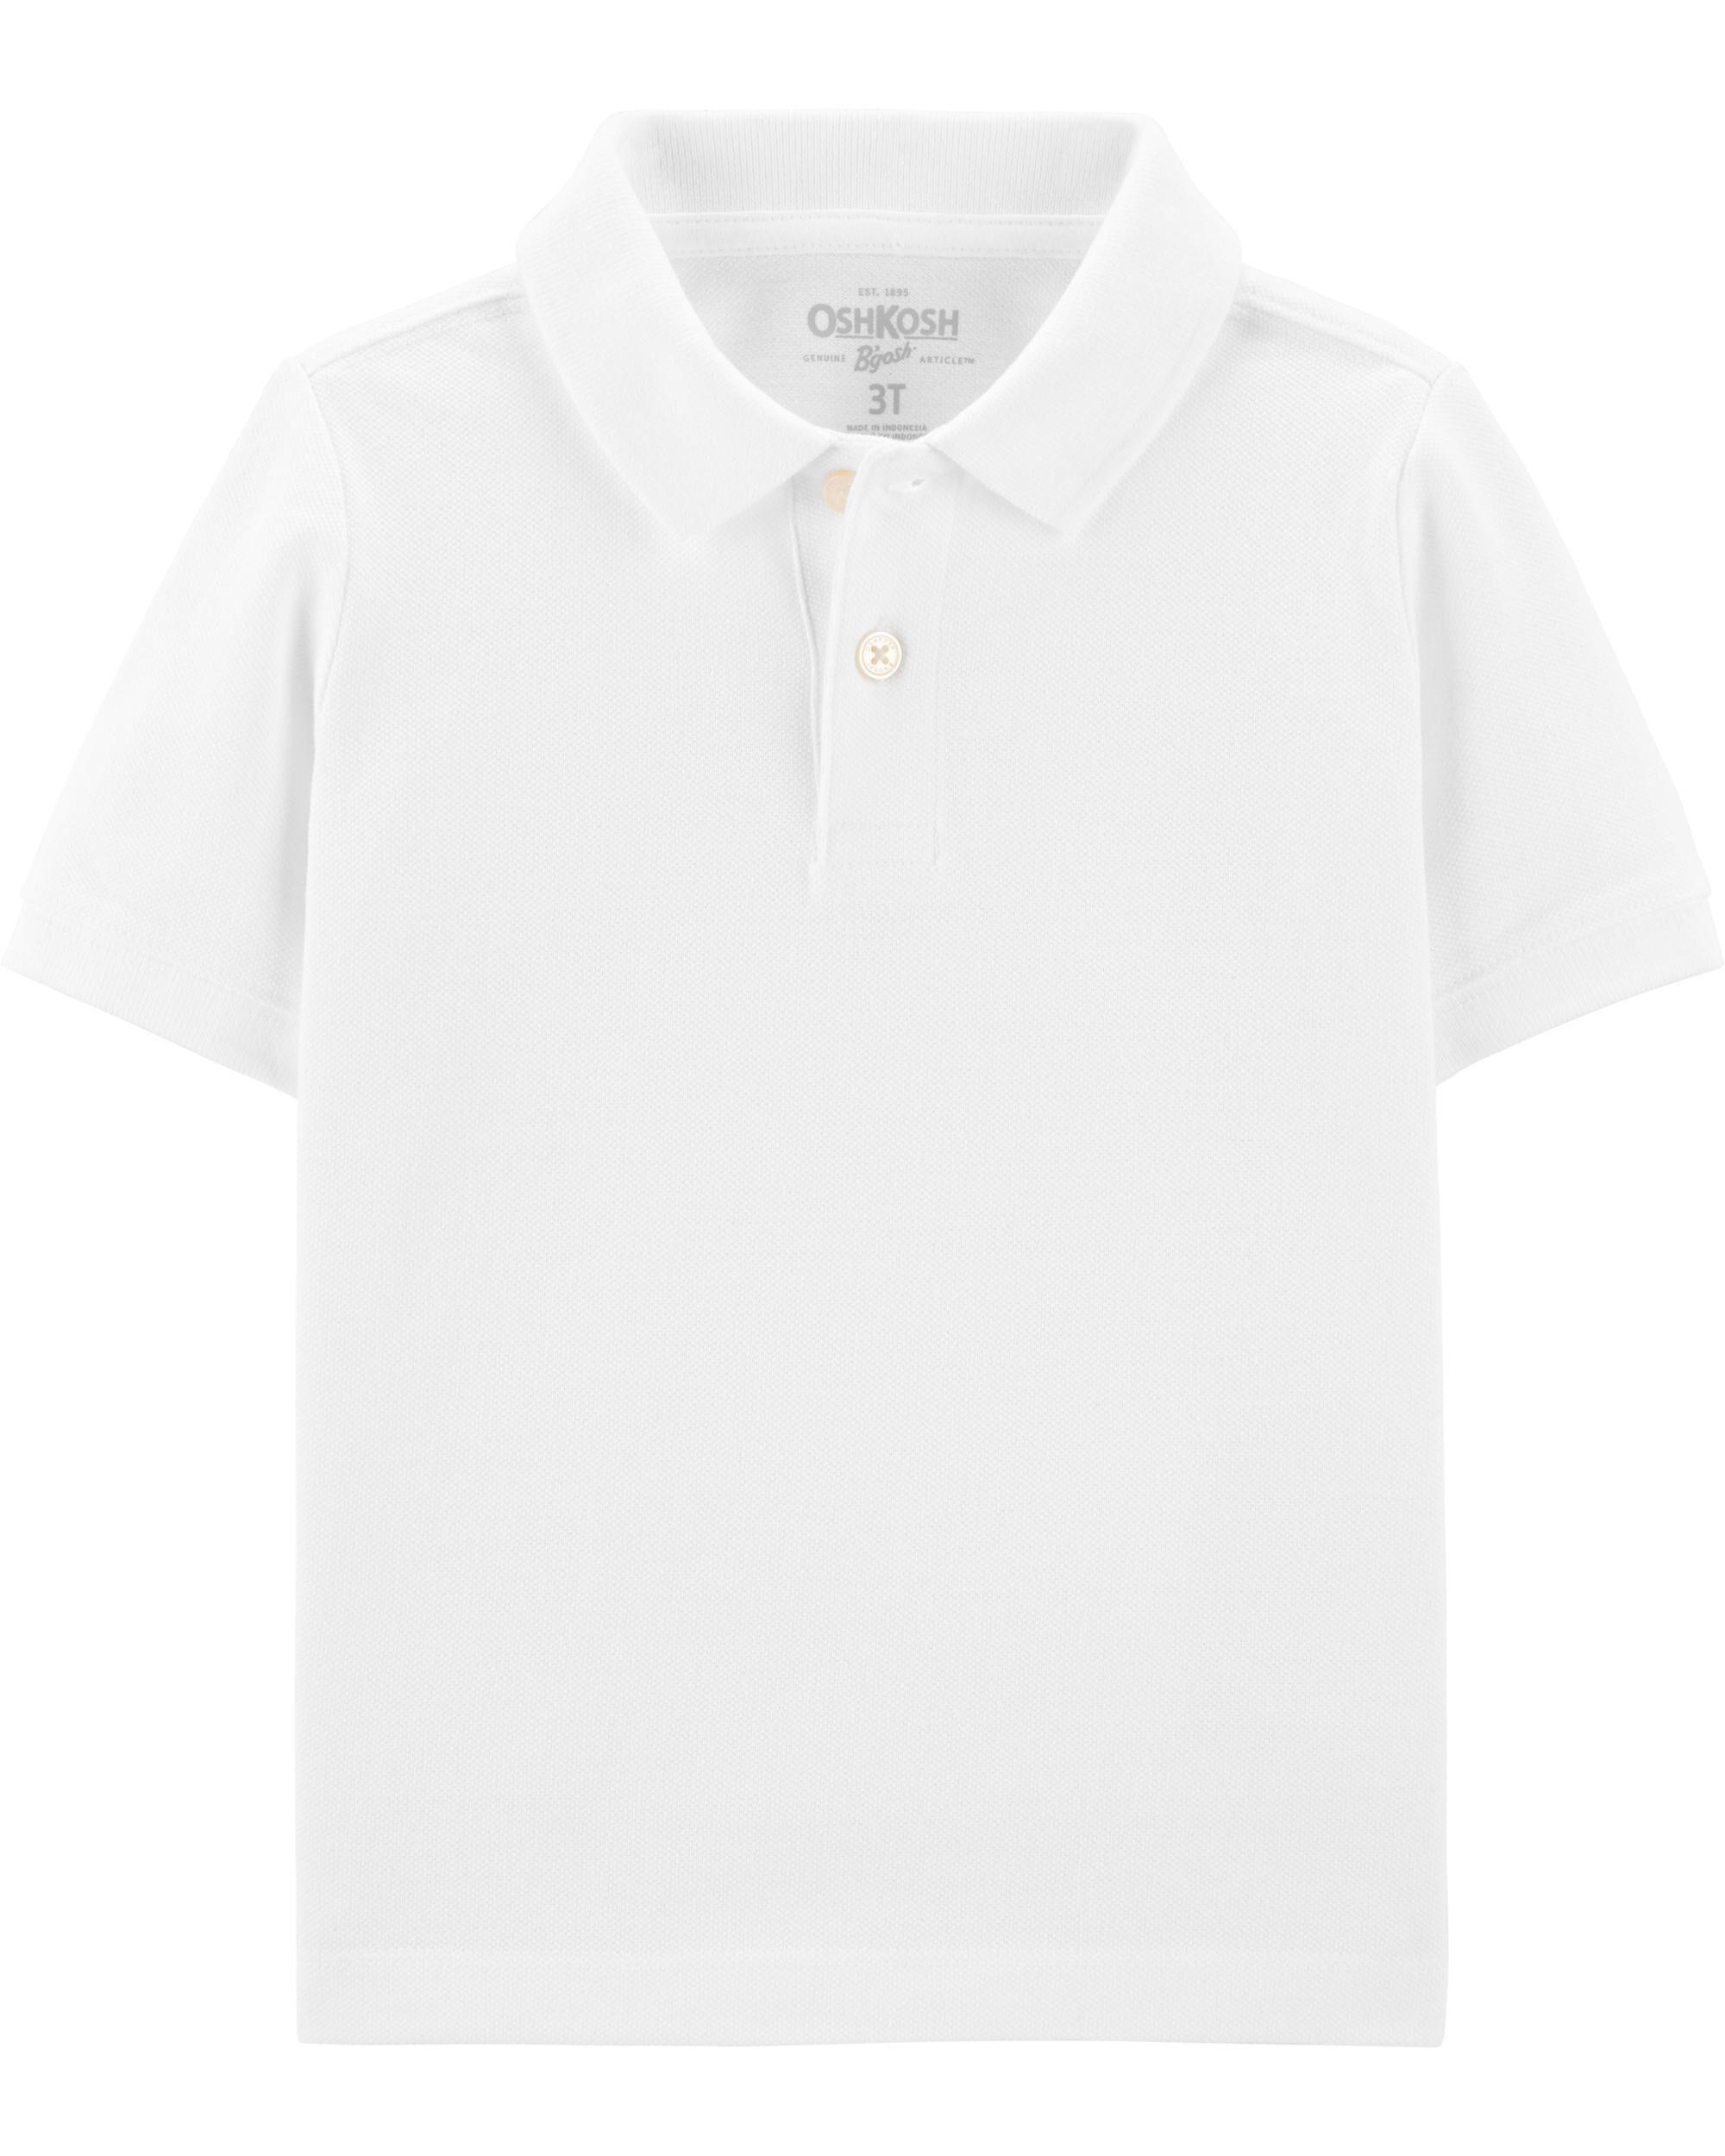 *CLEARANCE* Pique Uniform Polo